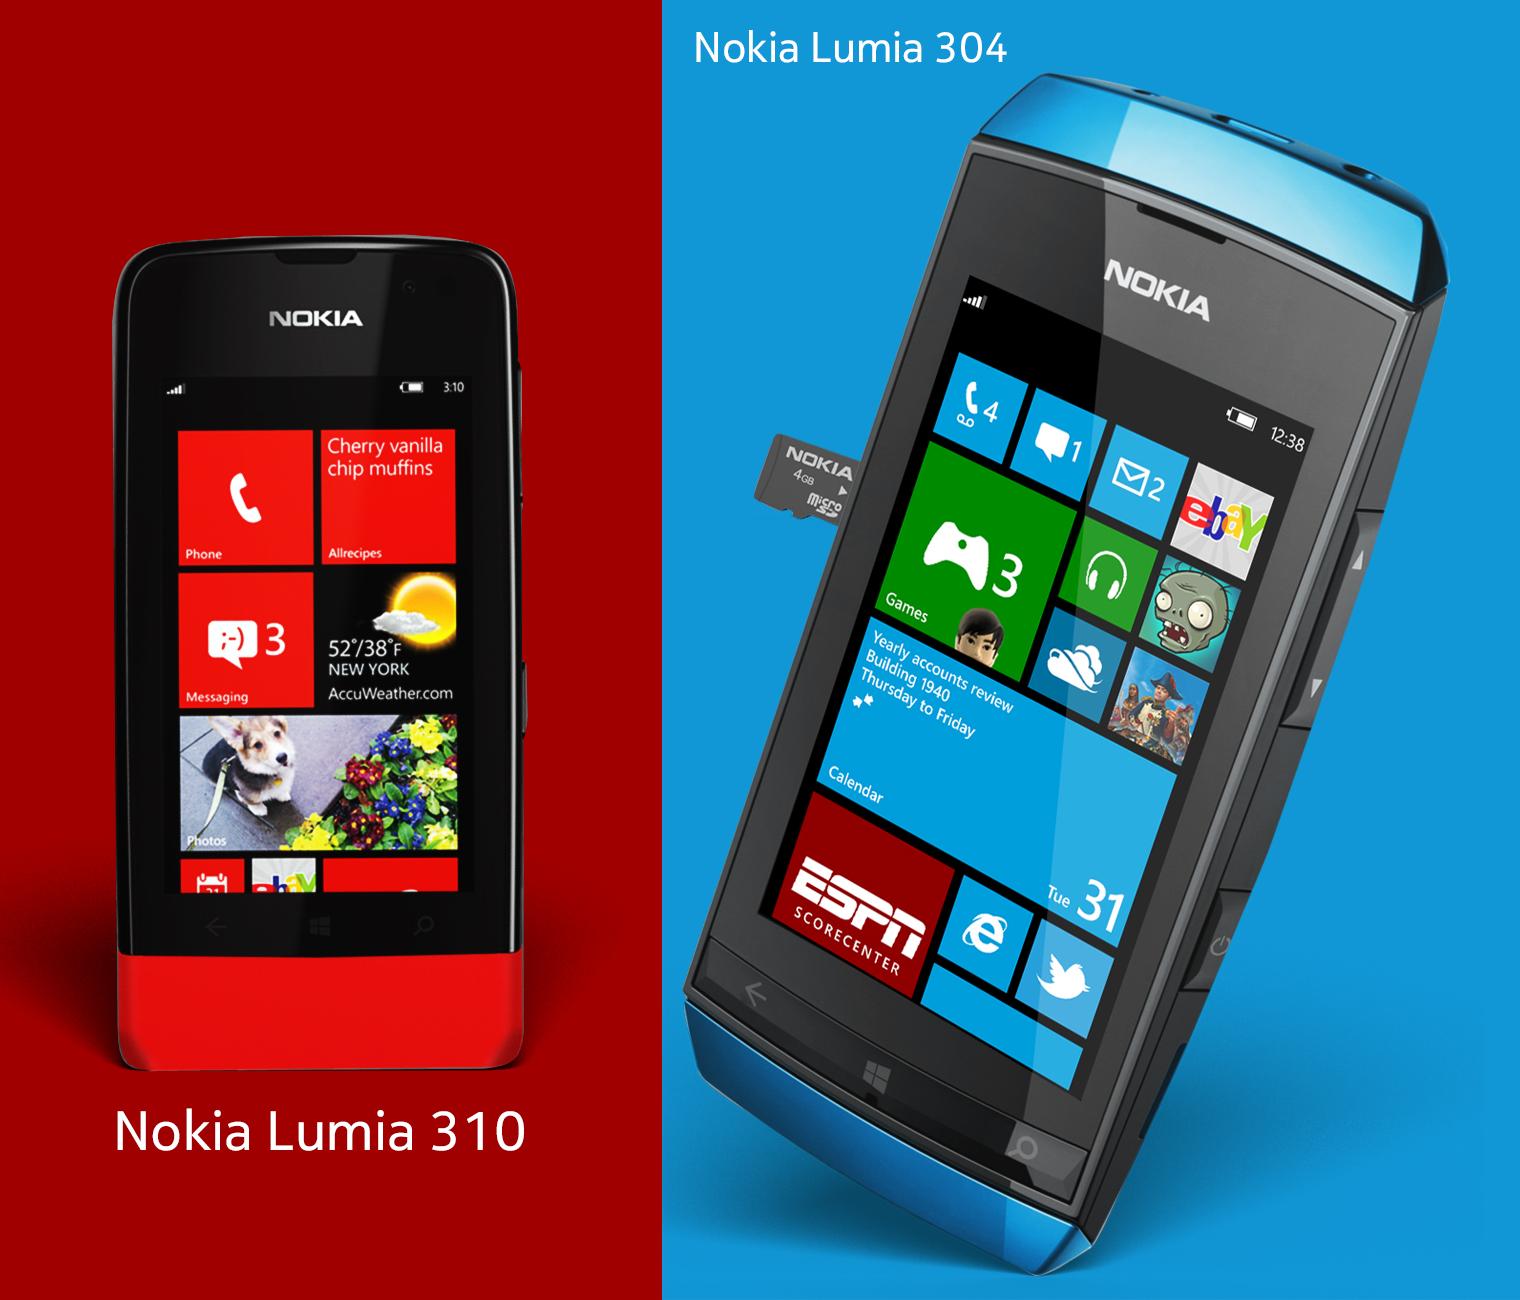 Nokia Feature Smartphones by MetroUI